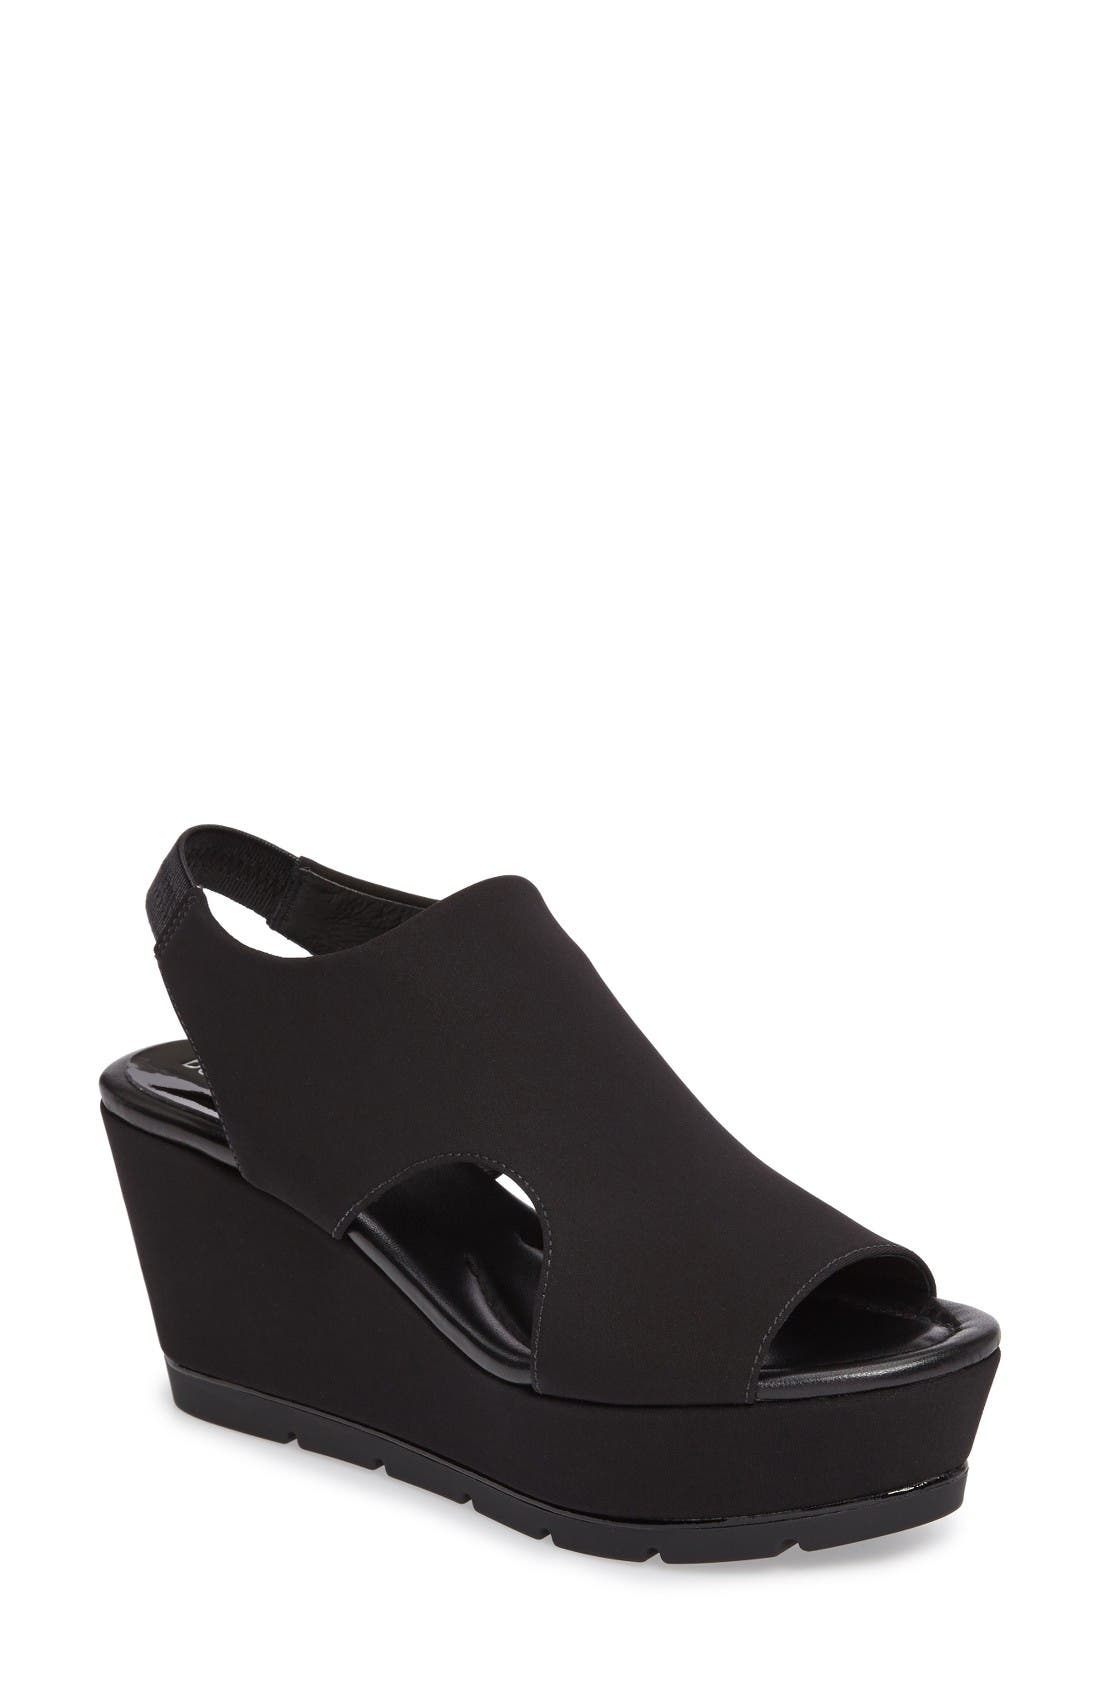 Donald J Pliner Fonda Platform Wedge Sandal,                             Main thumbnail 1, color,                             Black Crepe